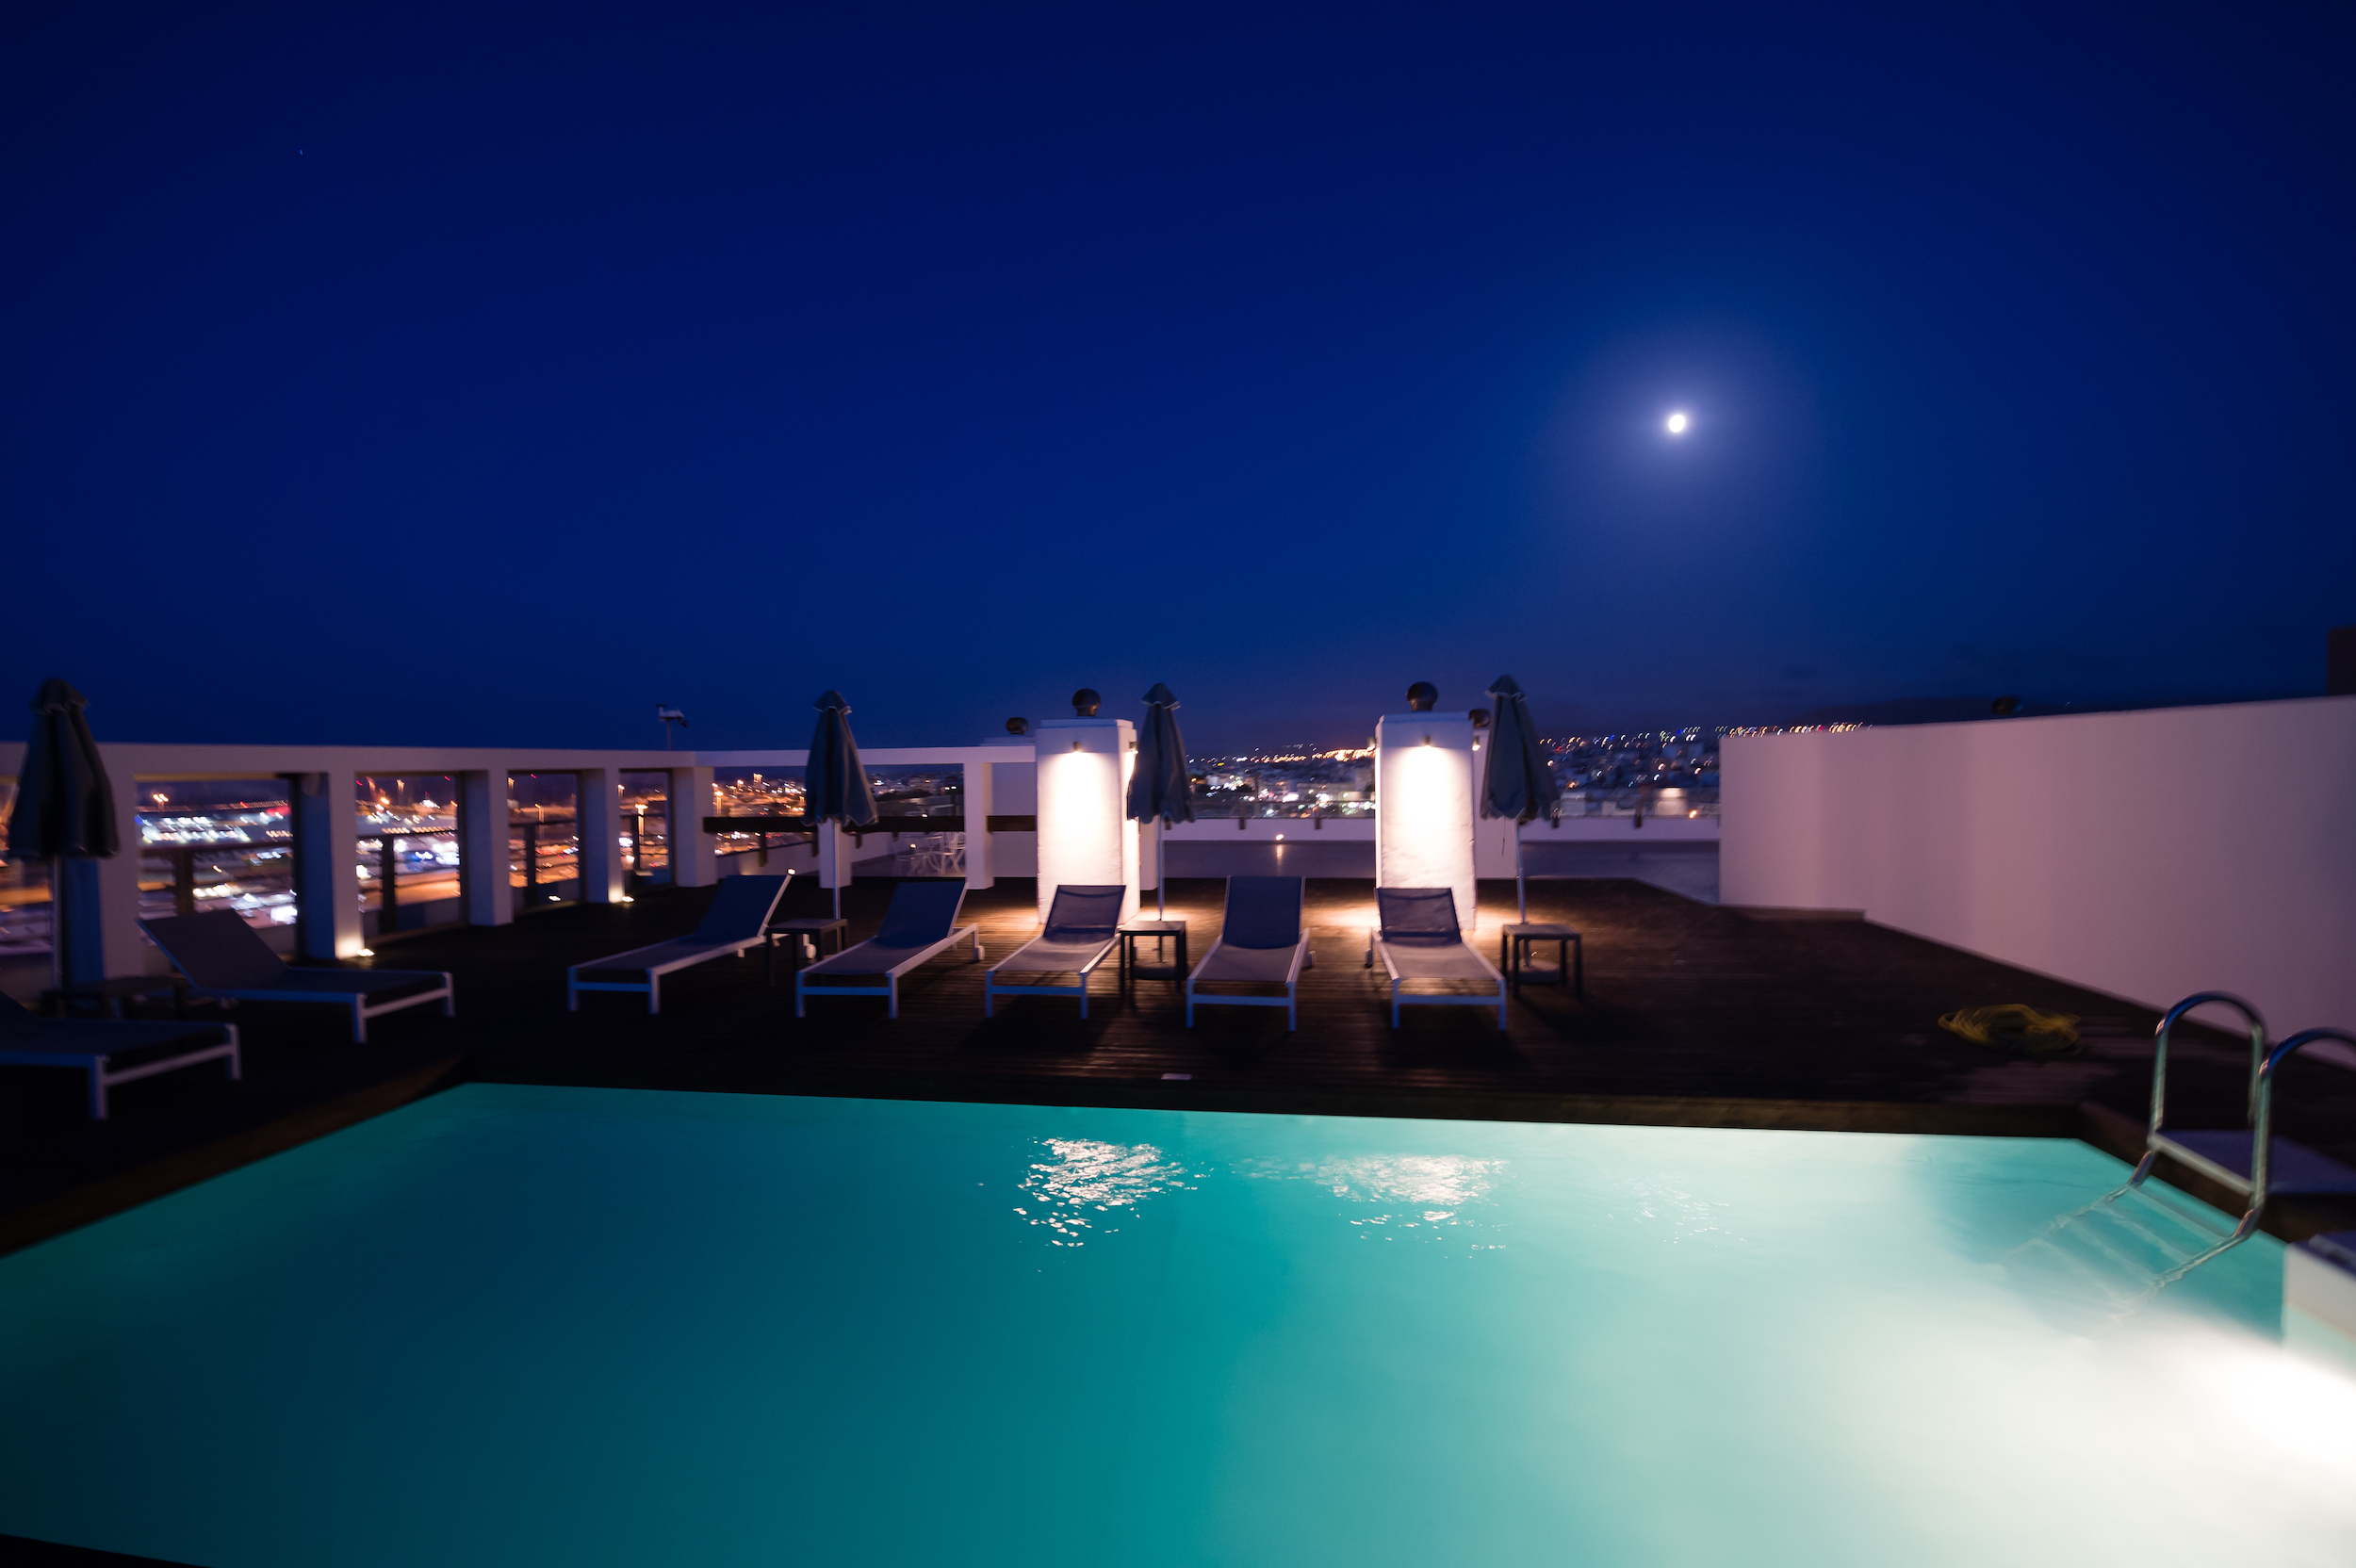 aquila atlantis hotel - roof top pool 16